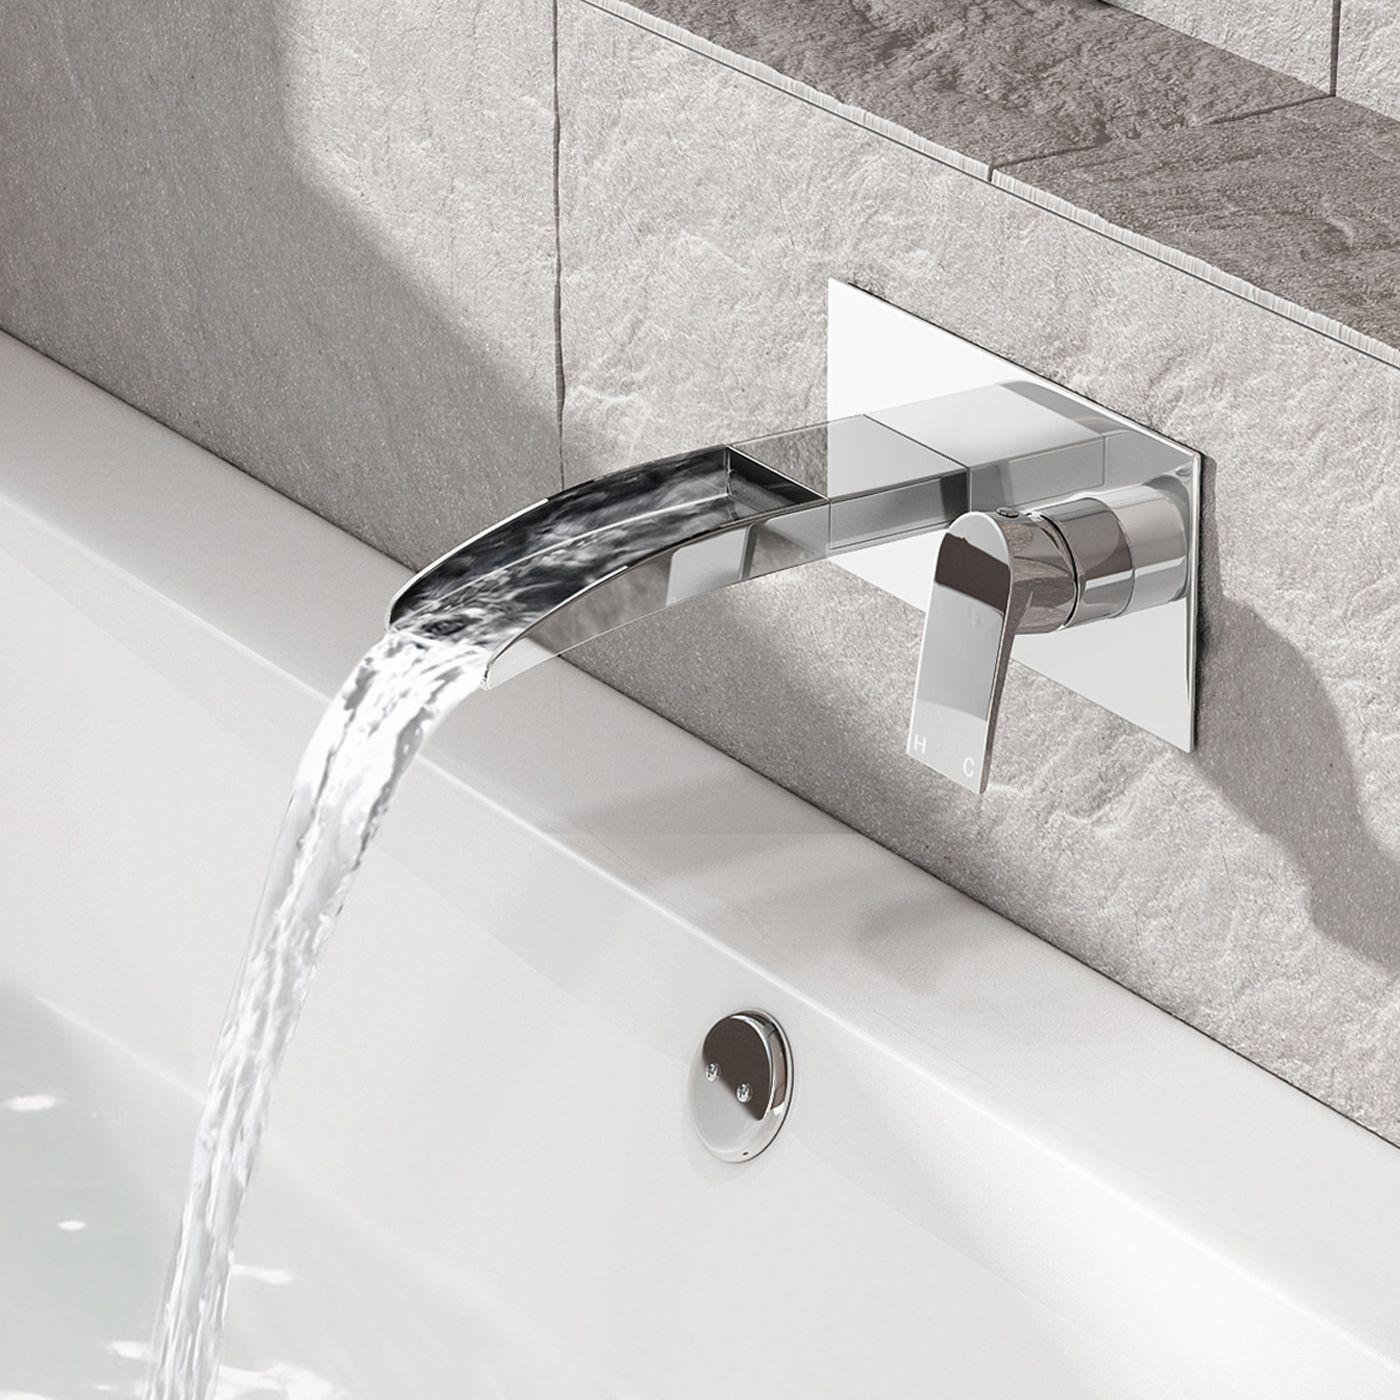 Avis Ii Wall Mounted Waterfall Bath Filler Mixer Tap